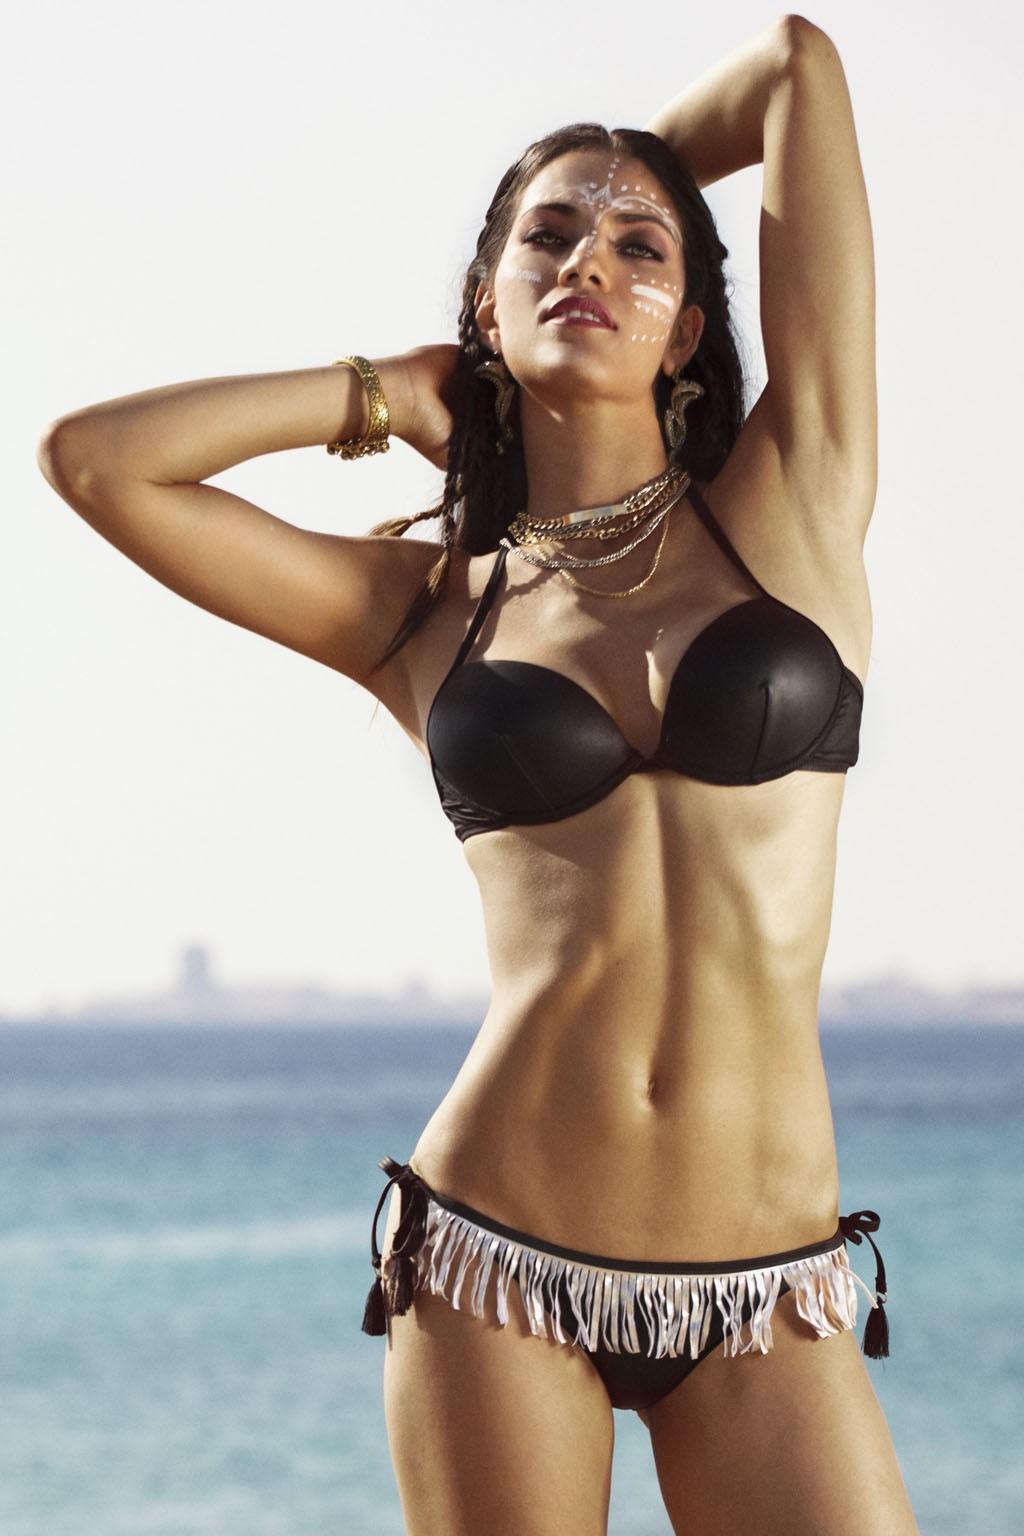 Bikini con reggiseno pushup in tinta unita con frange in contrasto sullo slip Sweet Years.